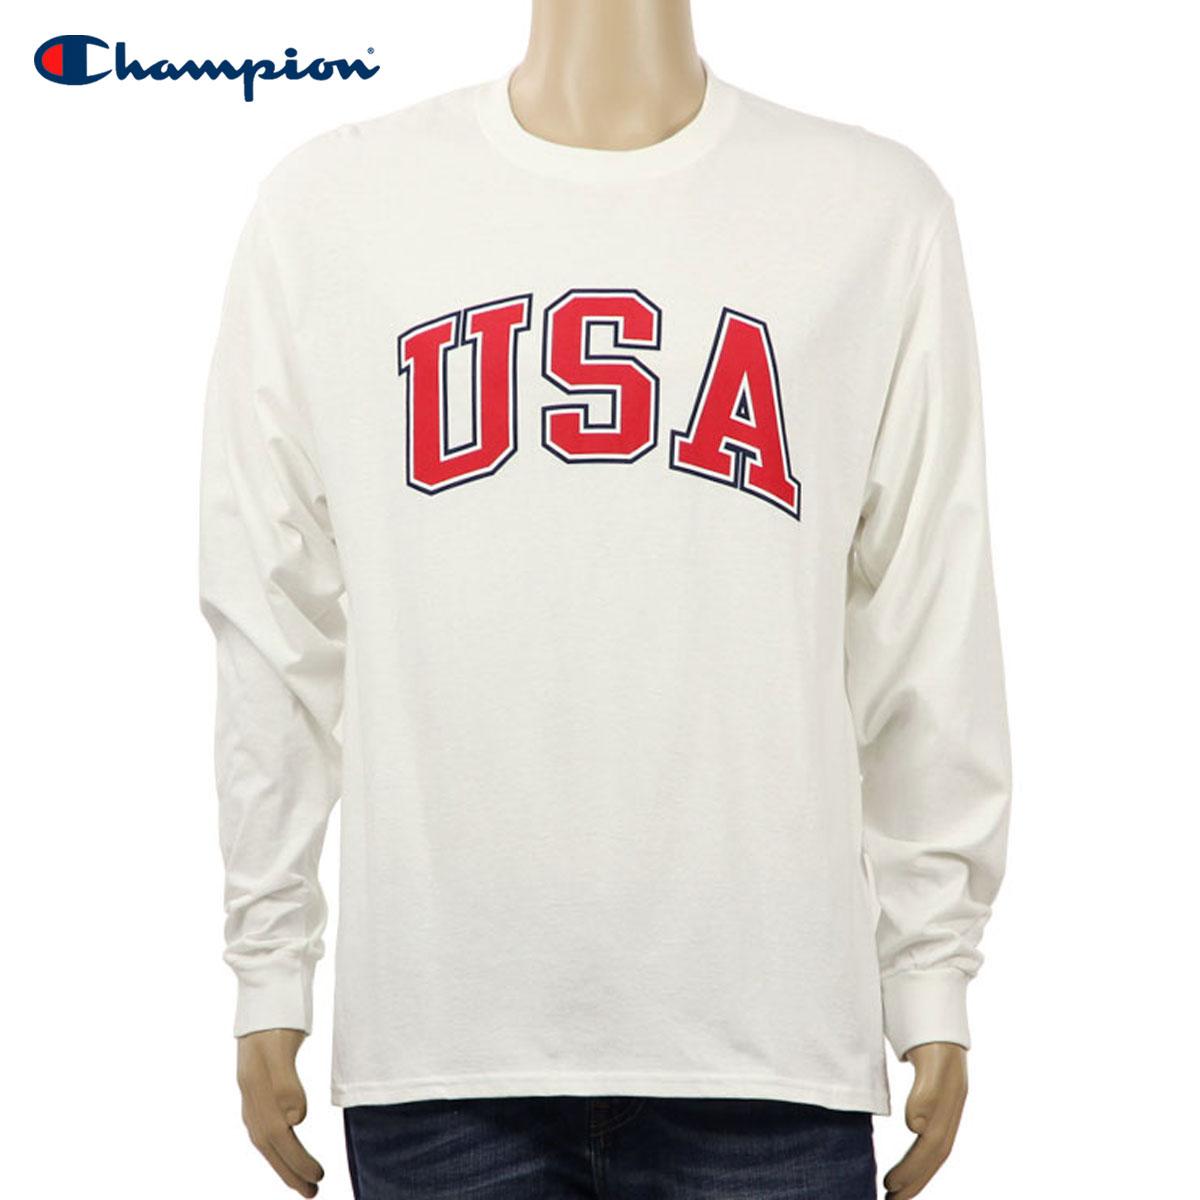 d2c4feb2c Champion CHAMPION regular article men long sleeves T-shirt L/S TEE T2229P  Cotton ...